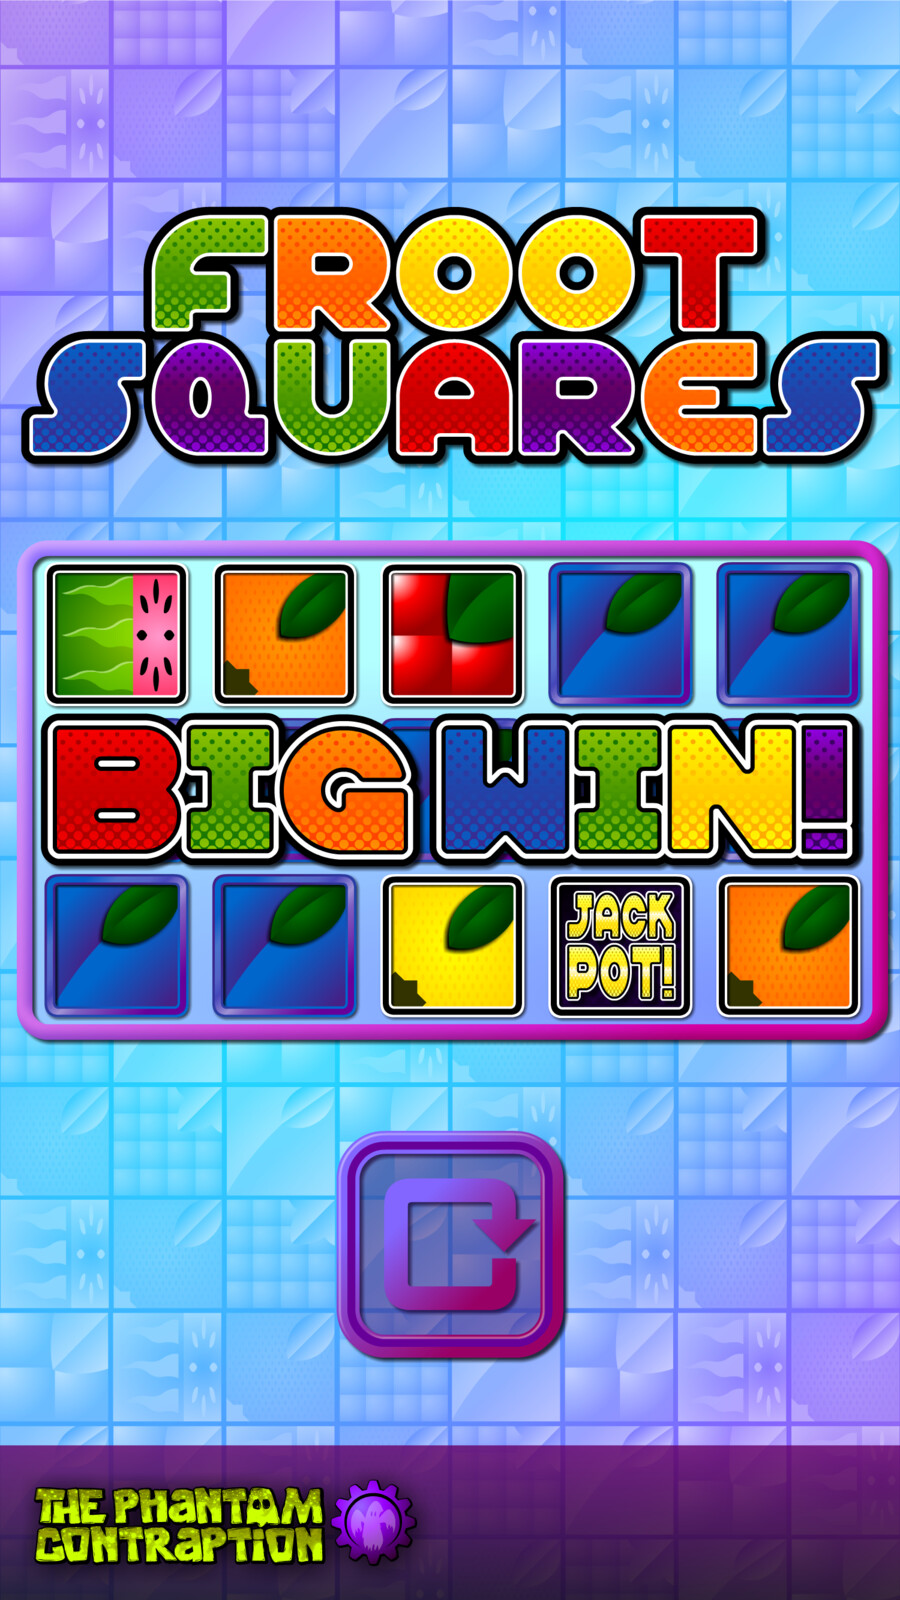 Froot Squares Portrait Screenshot: Big Win